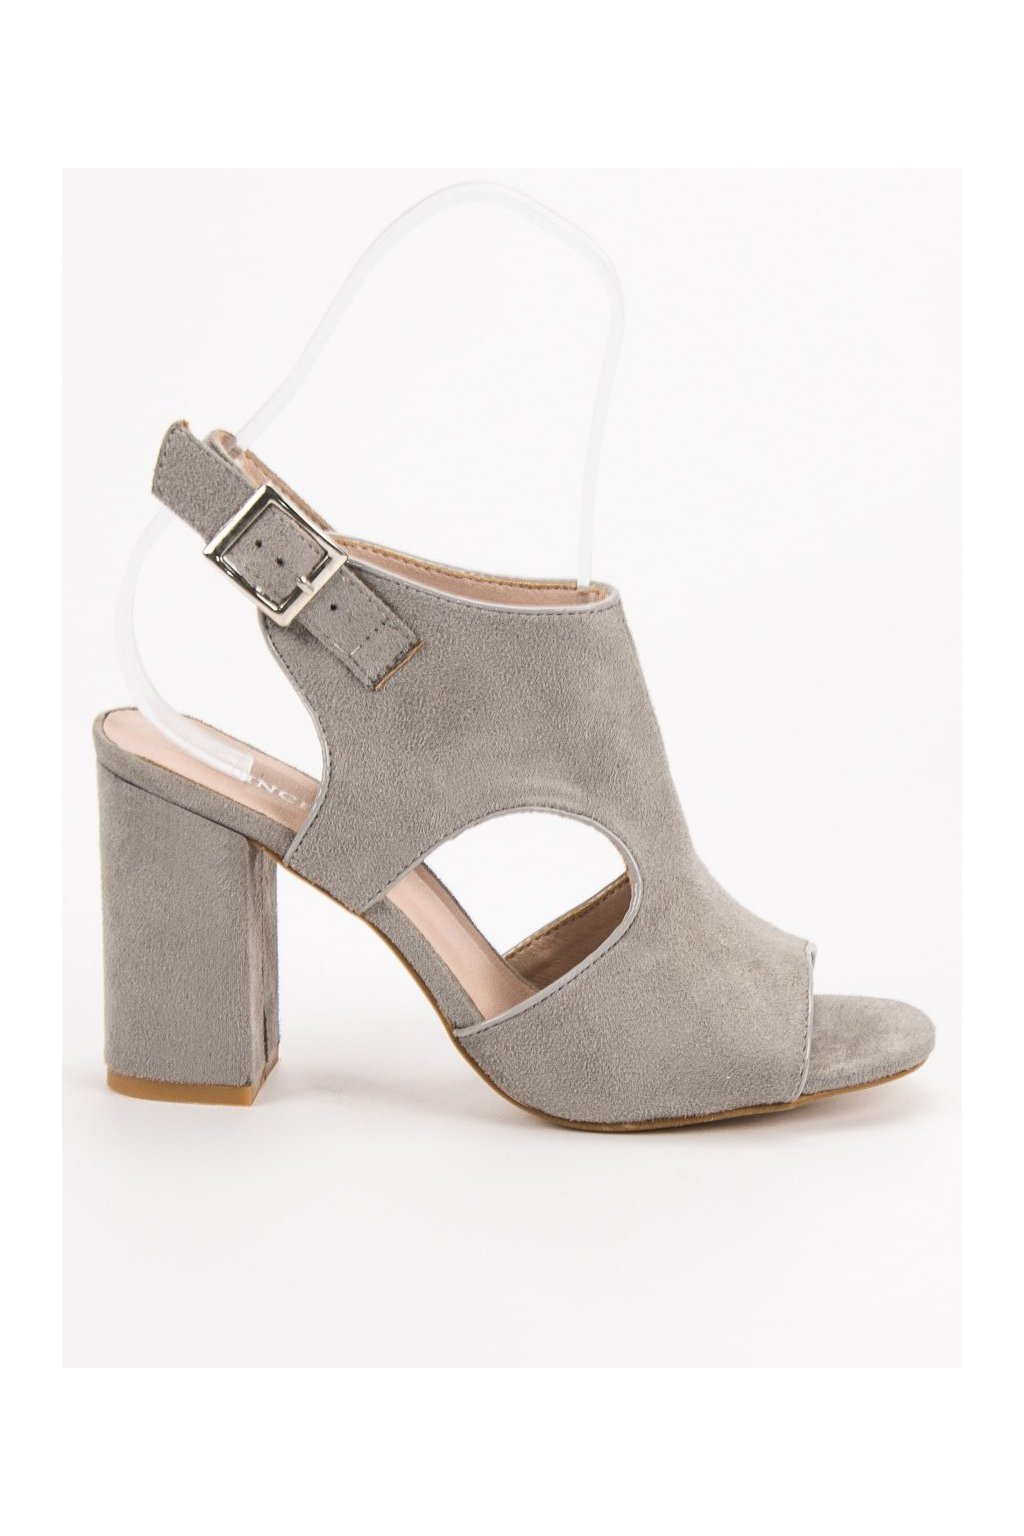 Sivé dámske sandále na na stĺpiku Vinceza YQE19-17004G